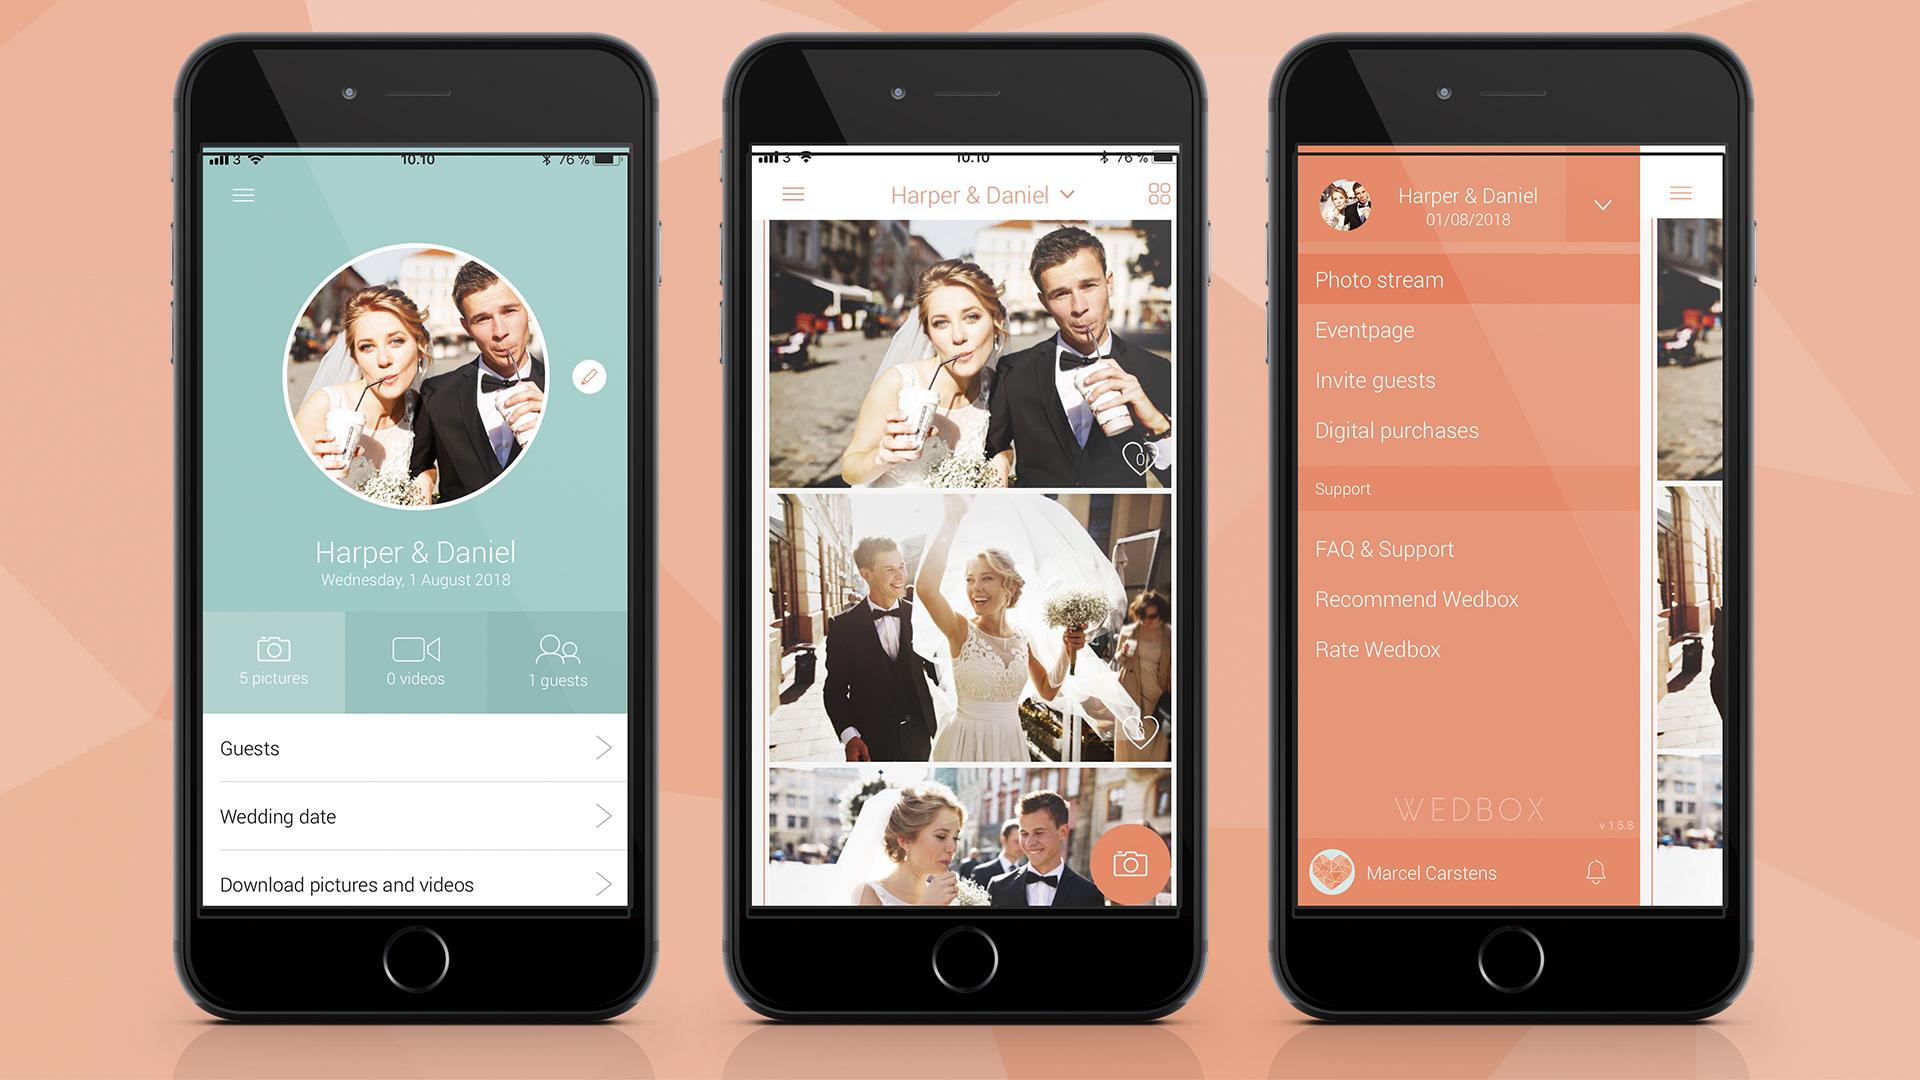 Wedbox app screens, best wedding planning app